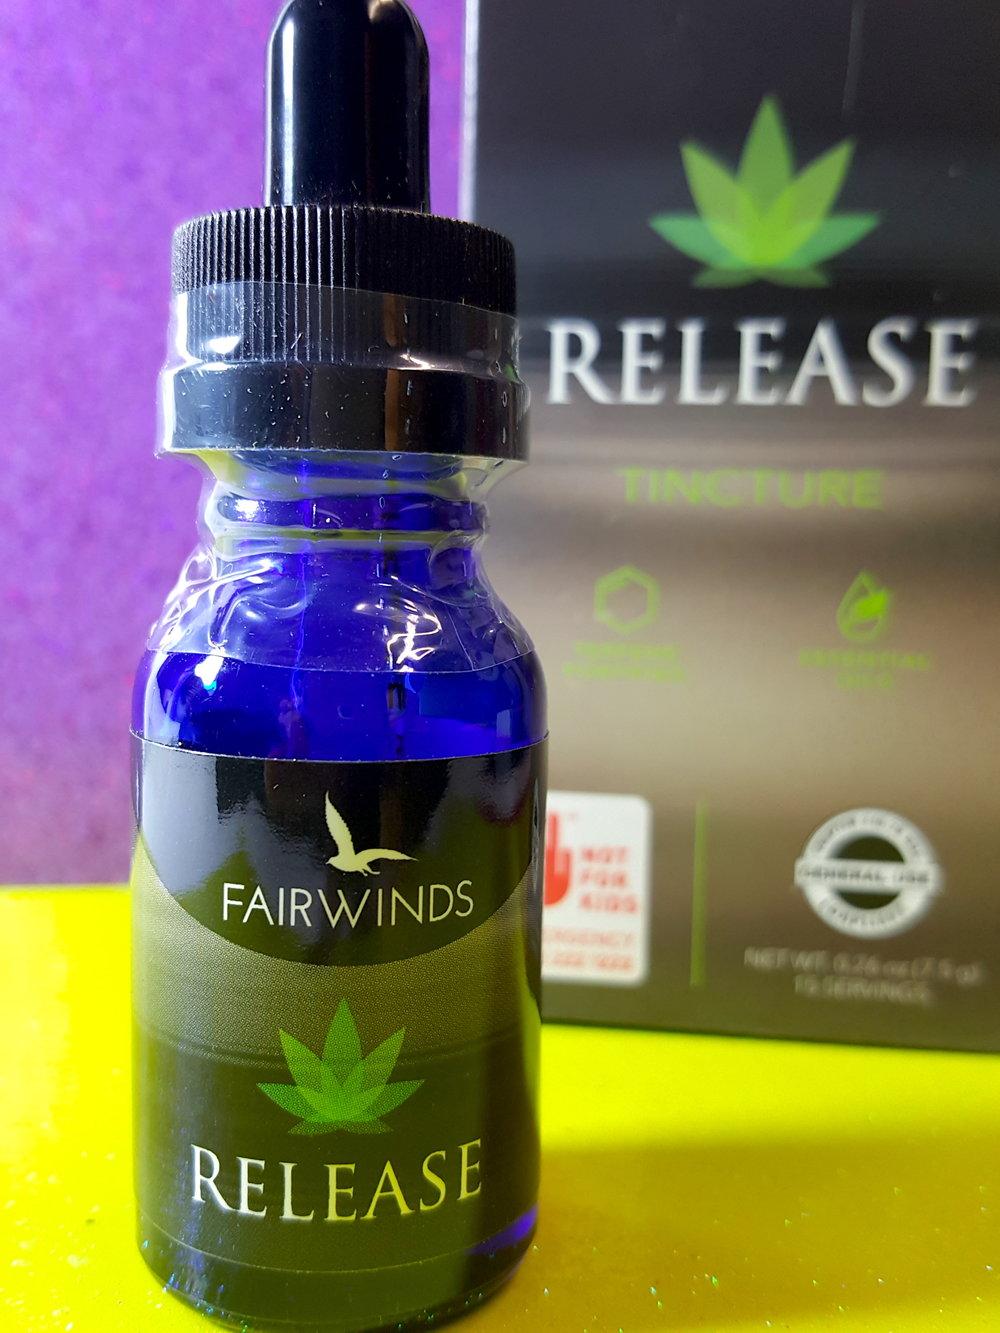 Fairwinds Cannabis Release Anti-Anxiety Tincture Ganja Goddess